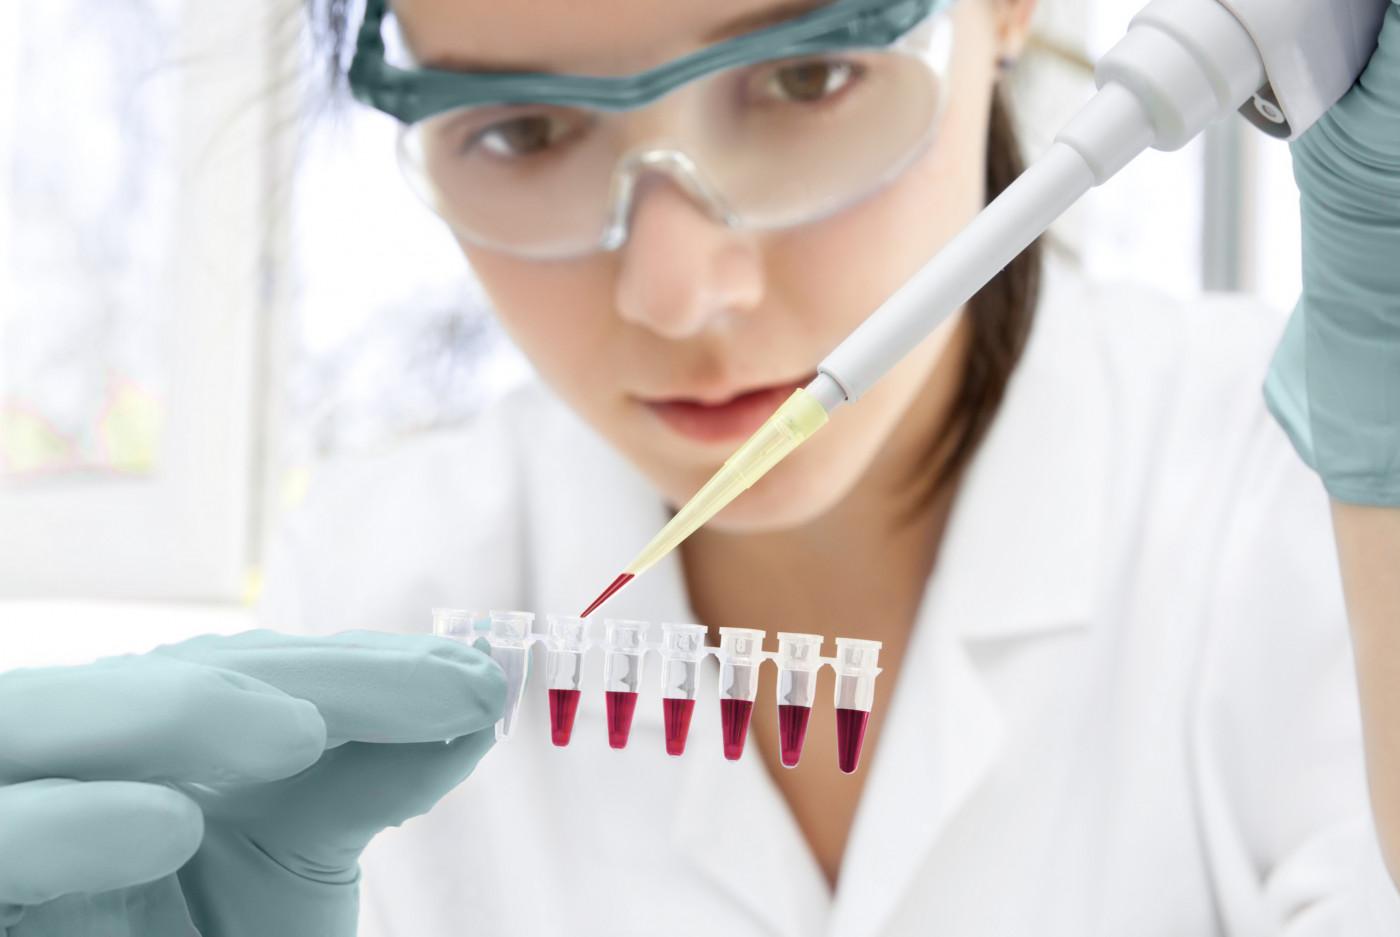 immunoglobulin G (IgG) levels